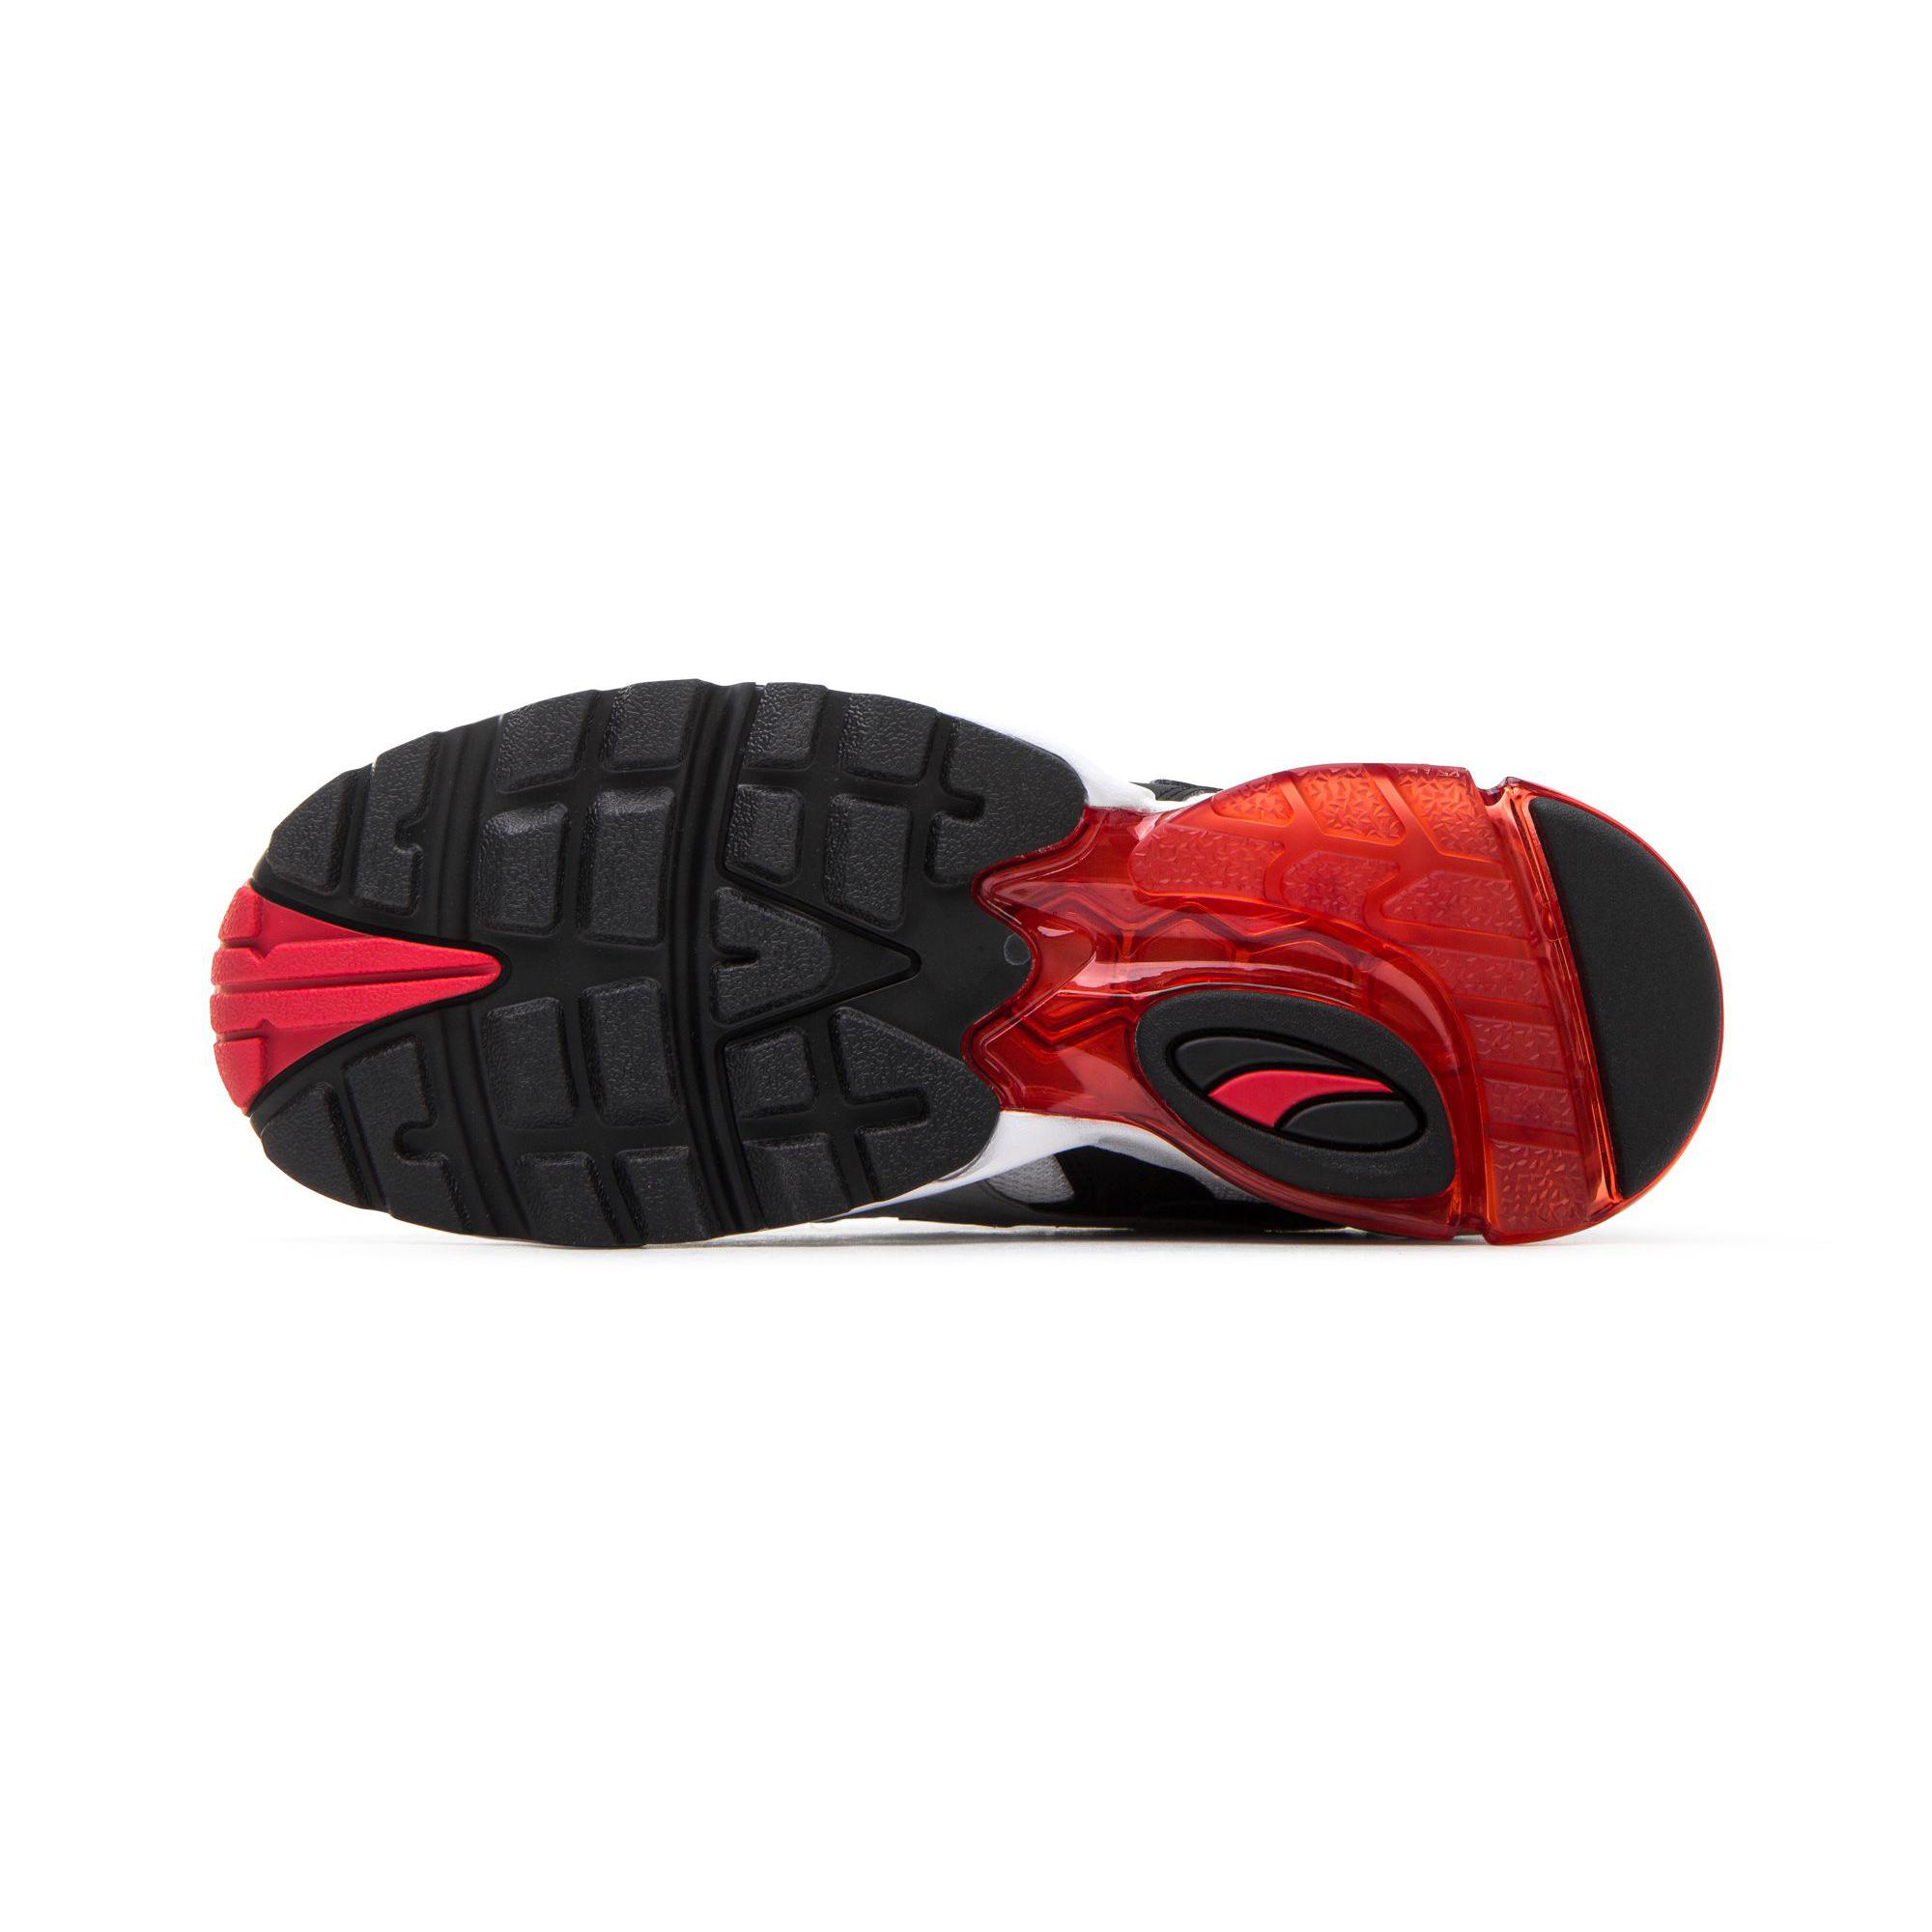 خرید                      کفش  دویدن مردانه پوما مدل Cell Alien OG